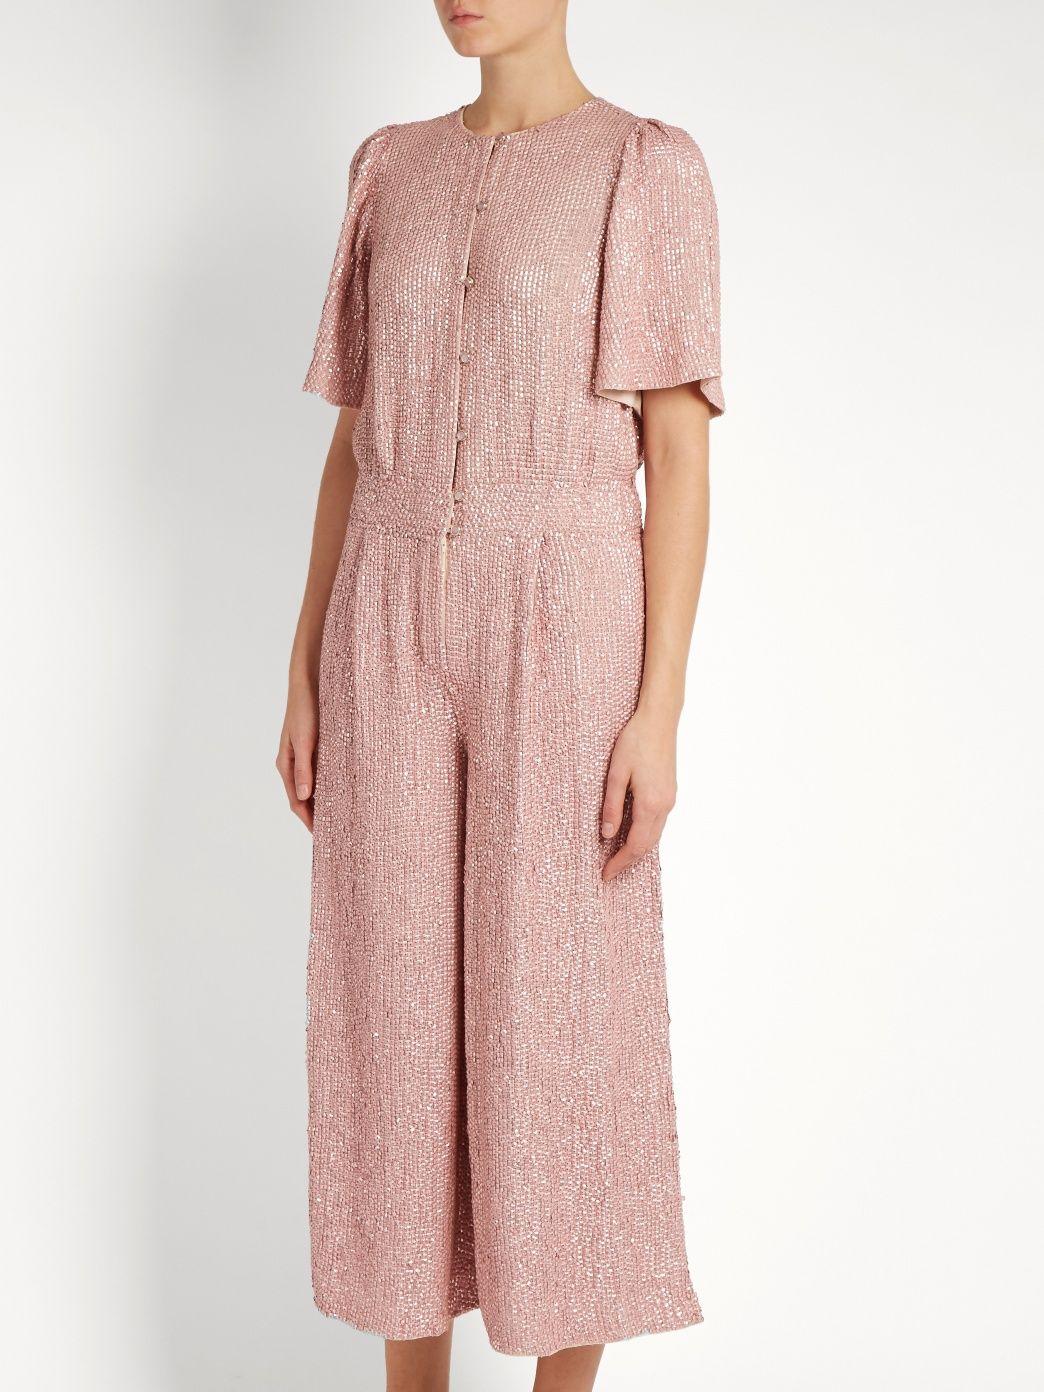 Fairyqueen Olina embellished jumpsuit | Temperley London | MATCHESFASHION.COM